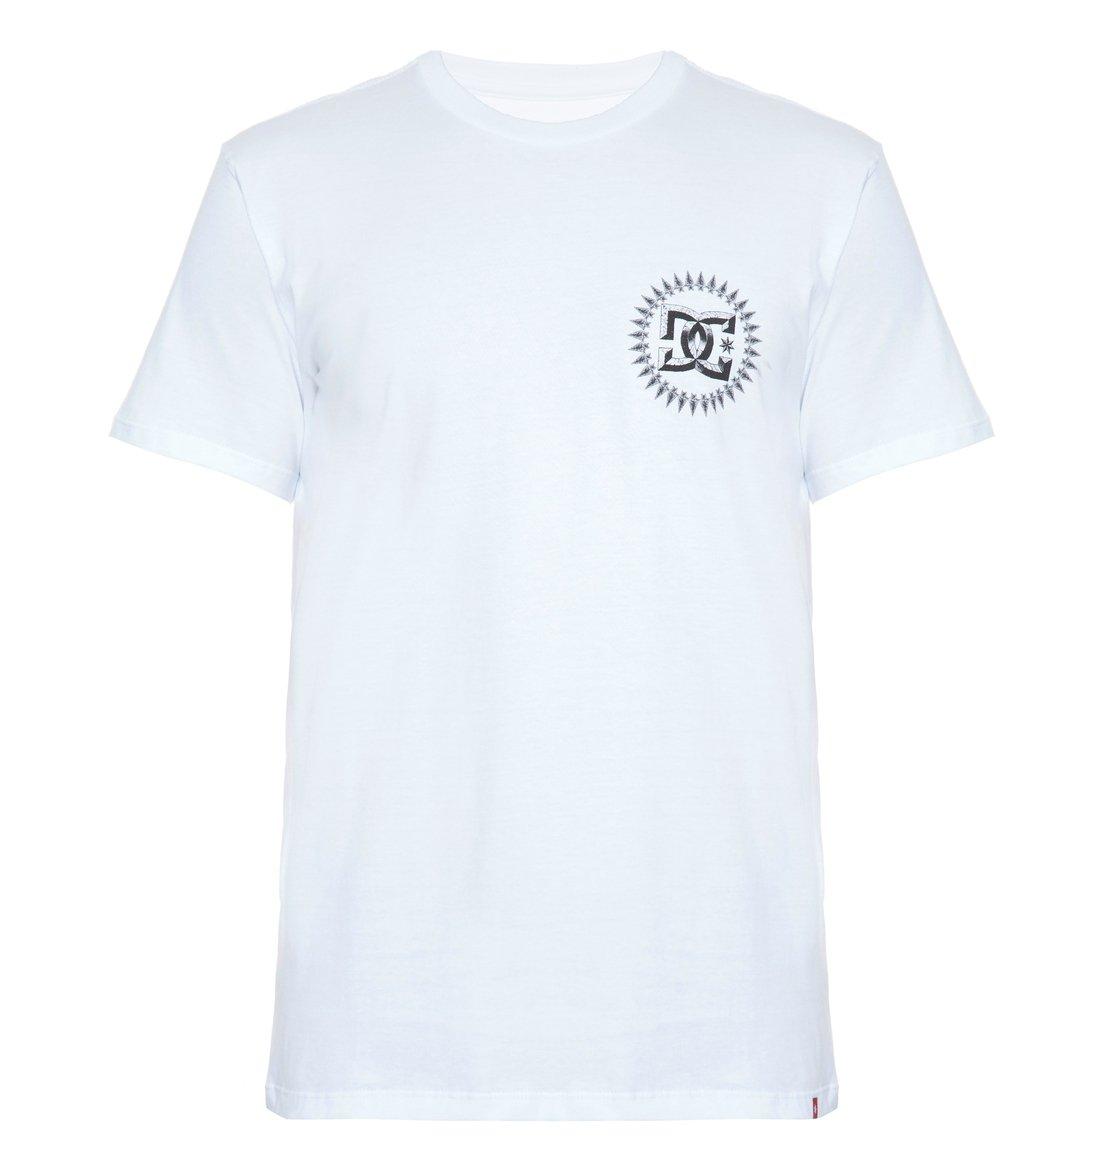 0 Camiseta básica m c masculina Tomahawks BR61113813 DC Shoes c56ee8d2996